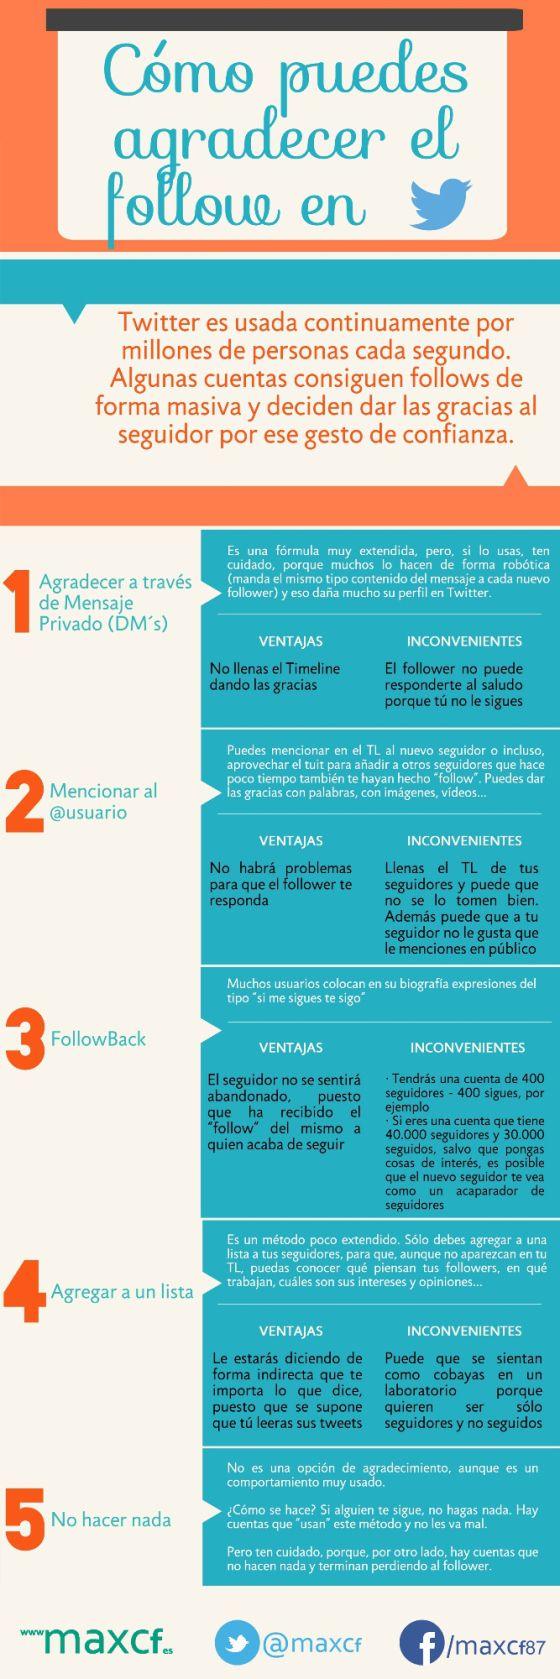 Cómo agradecer un follow en Twitter #infografia #infographic #socialmedia